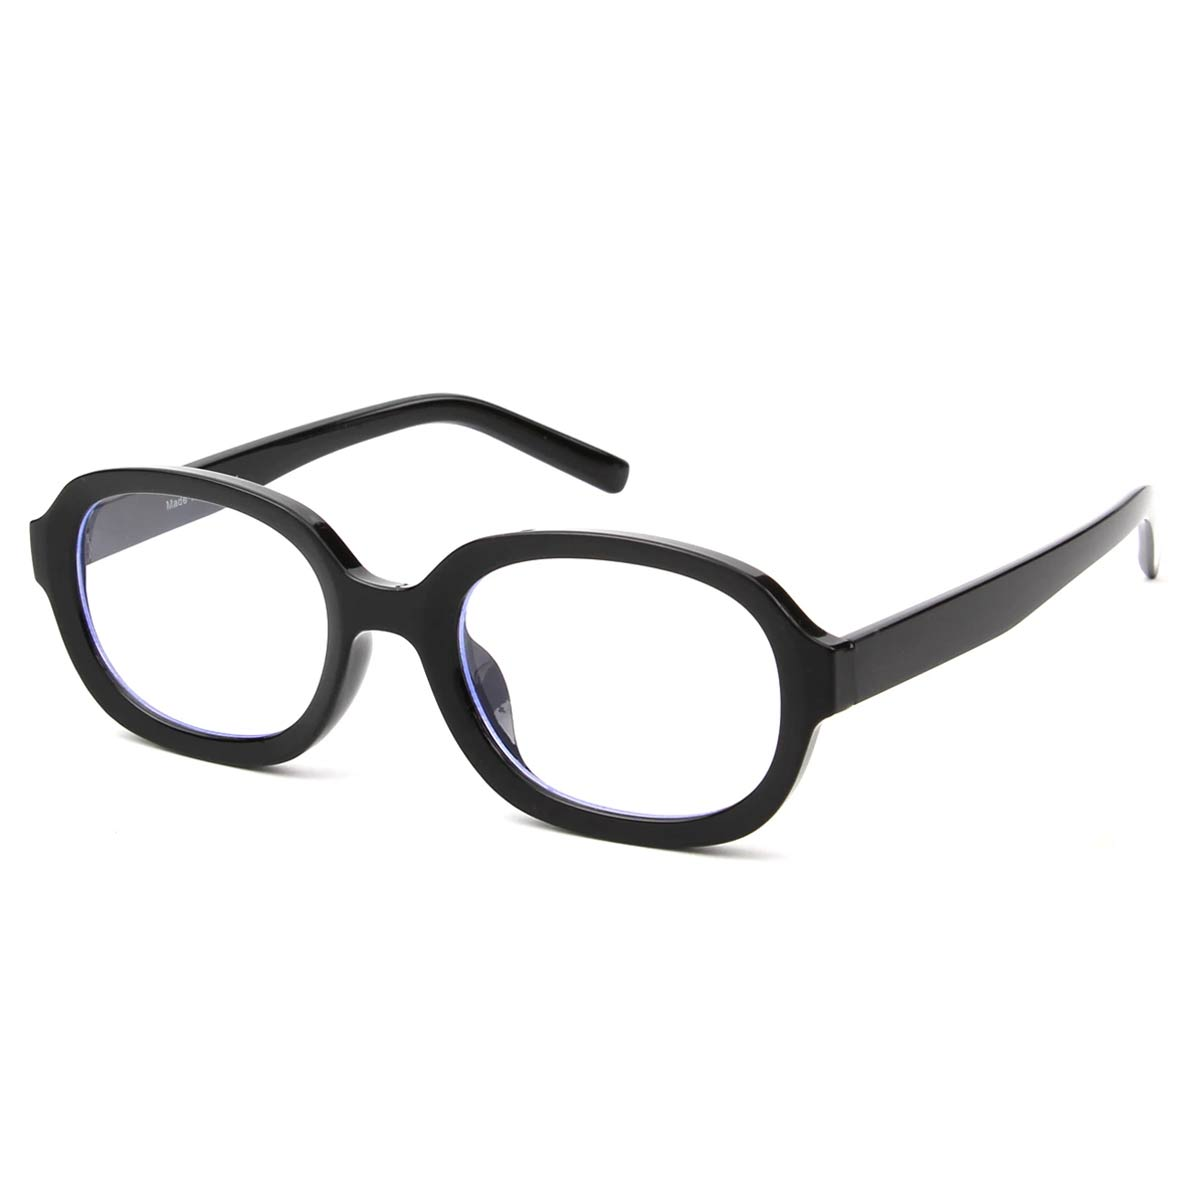 Black Oval Frame Blue Light Blocking Glasses